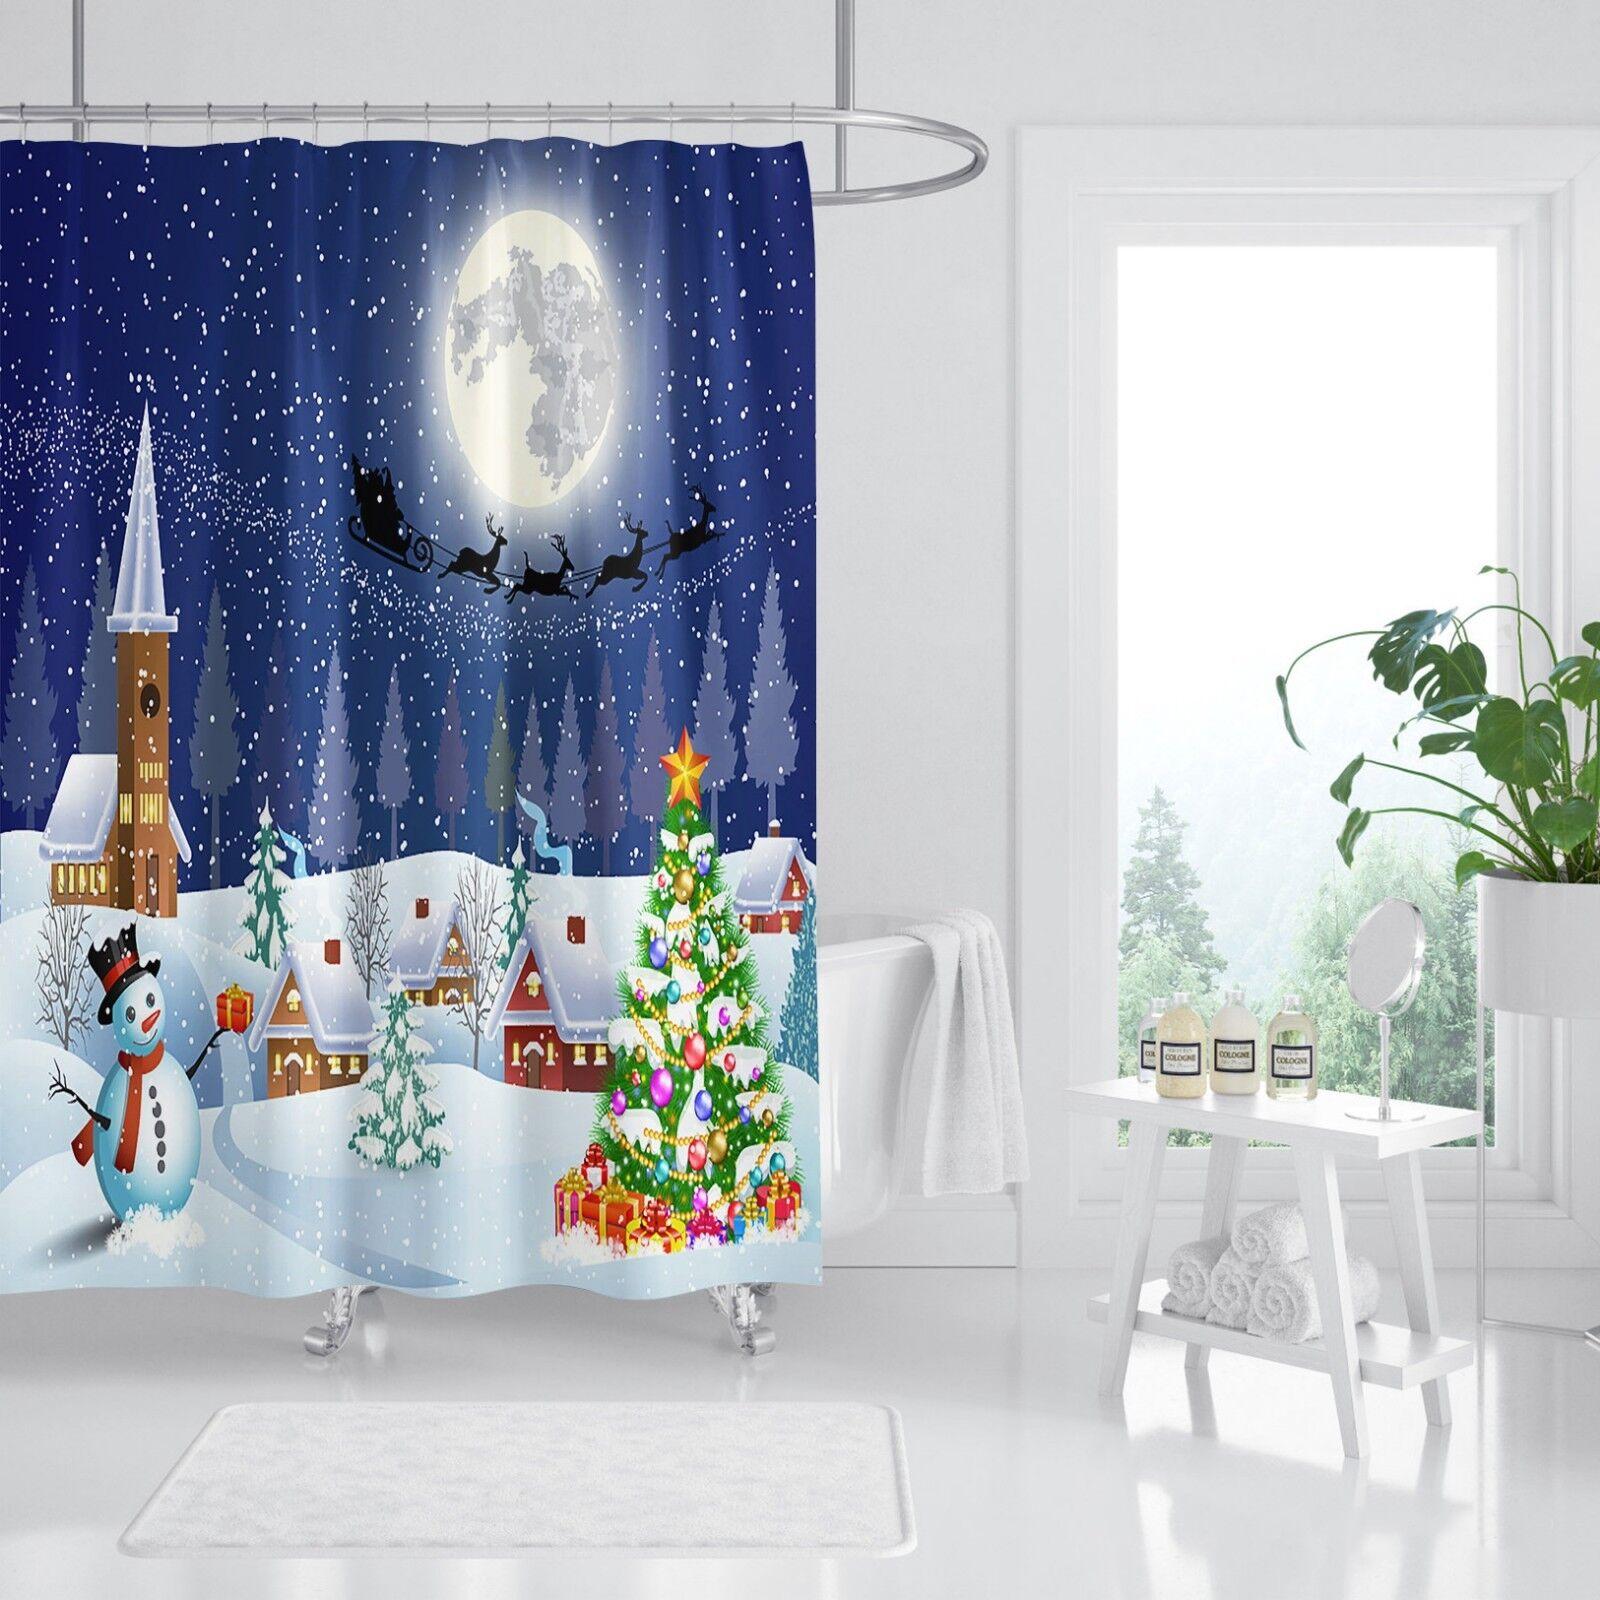 3D Christmas Night 8 Shower Curtain Waterproof Fiber Bathroom Bathroom Bathroom Windows Toilet 072ecd